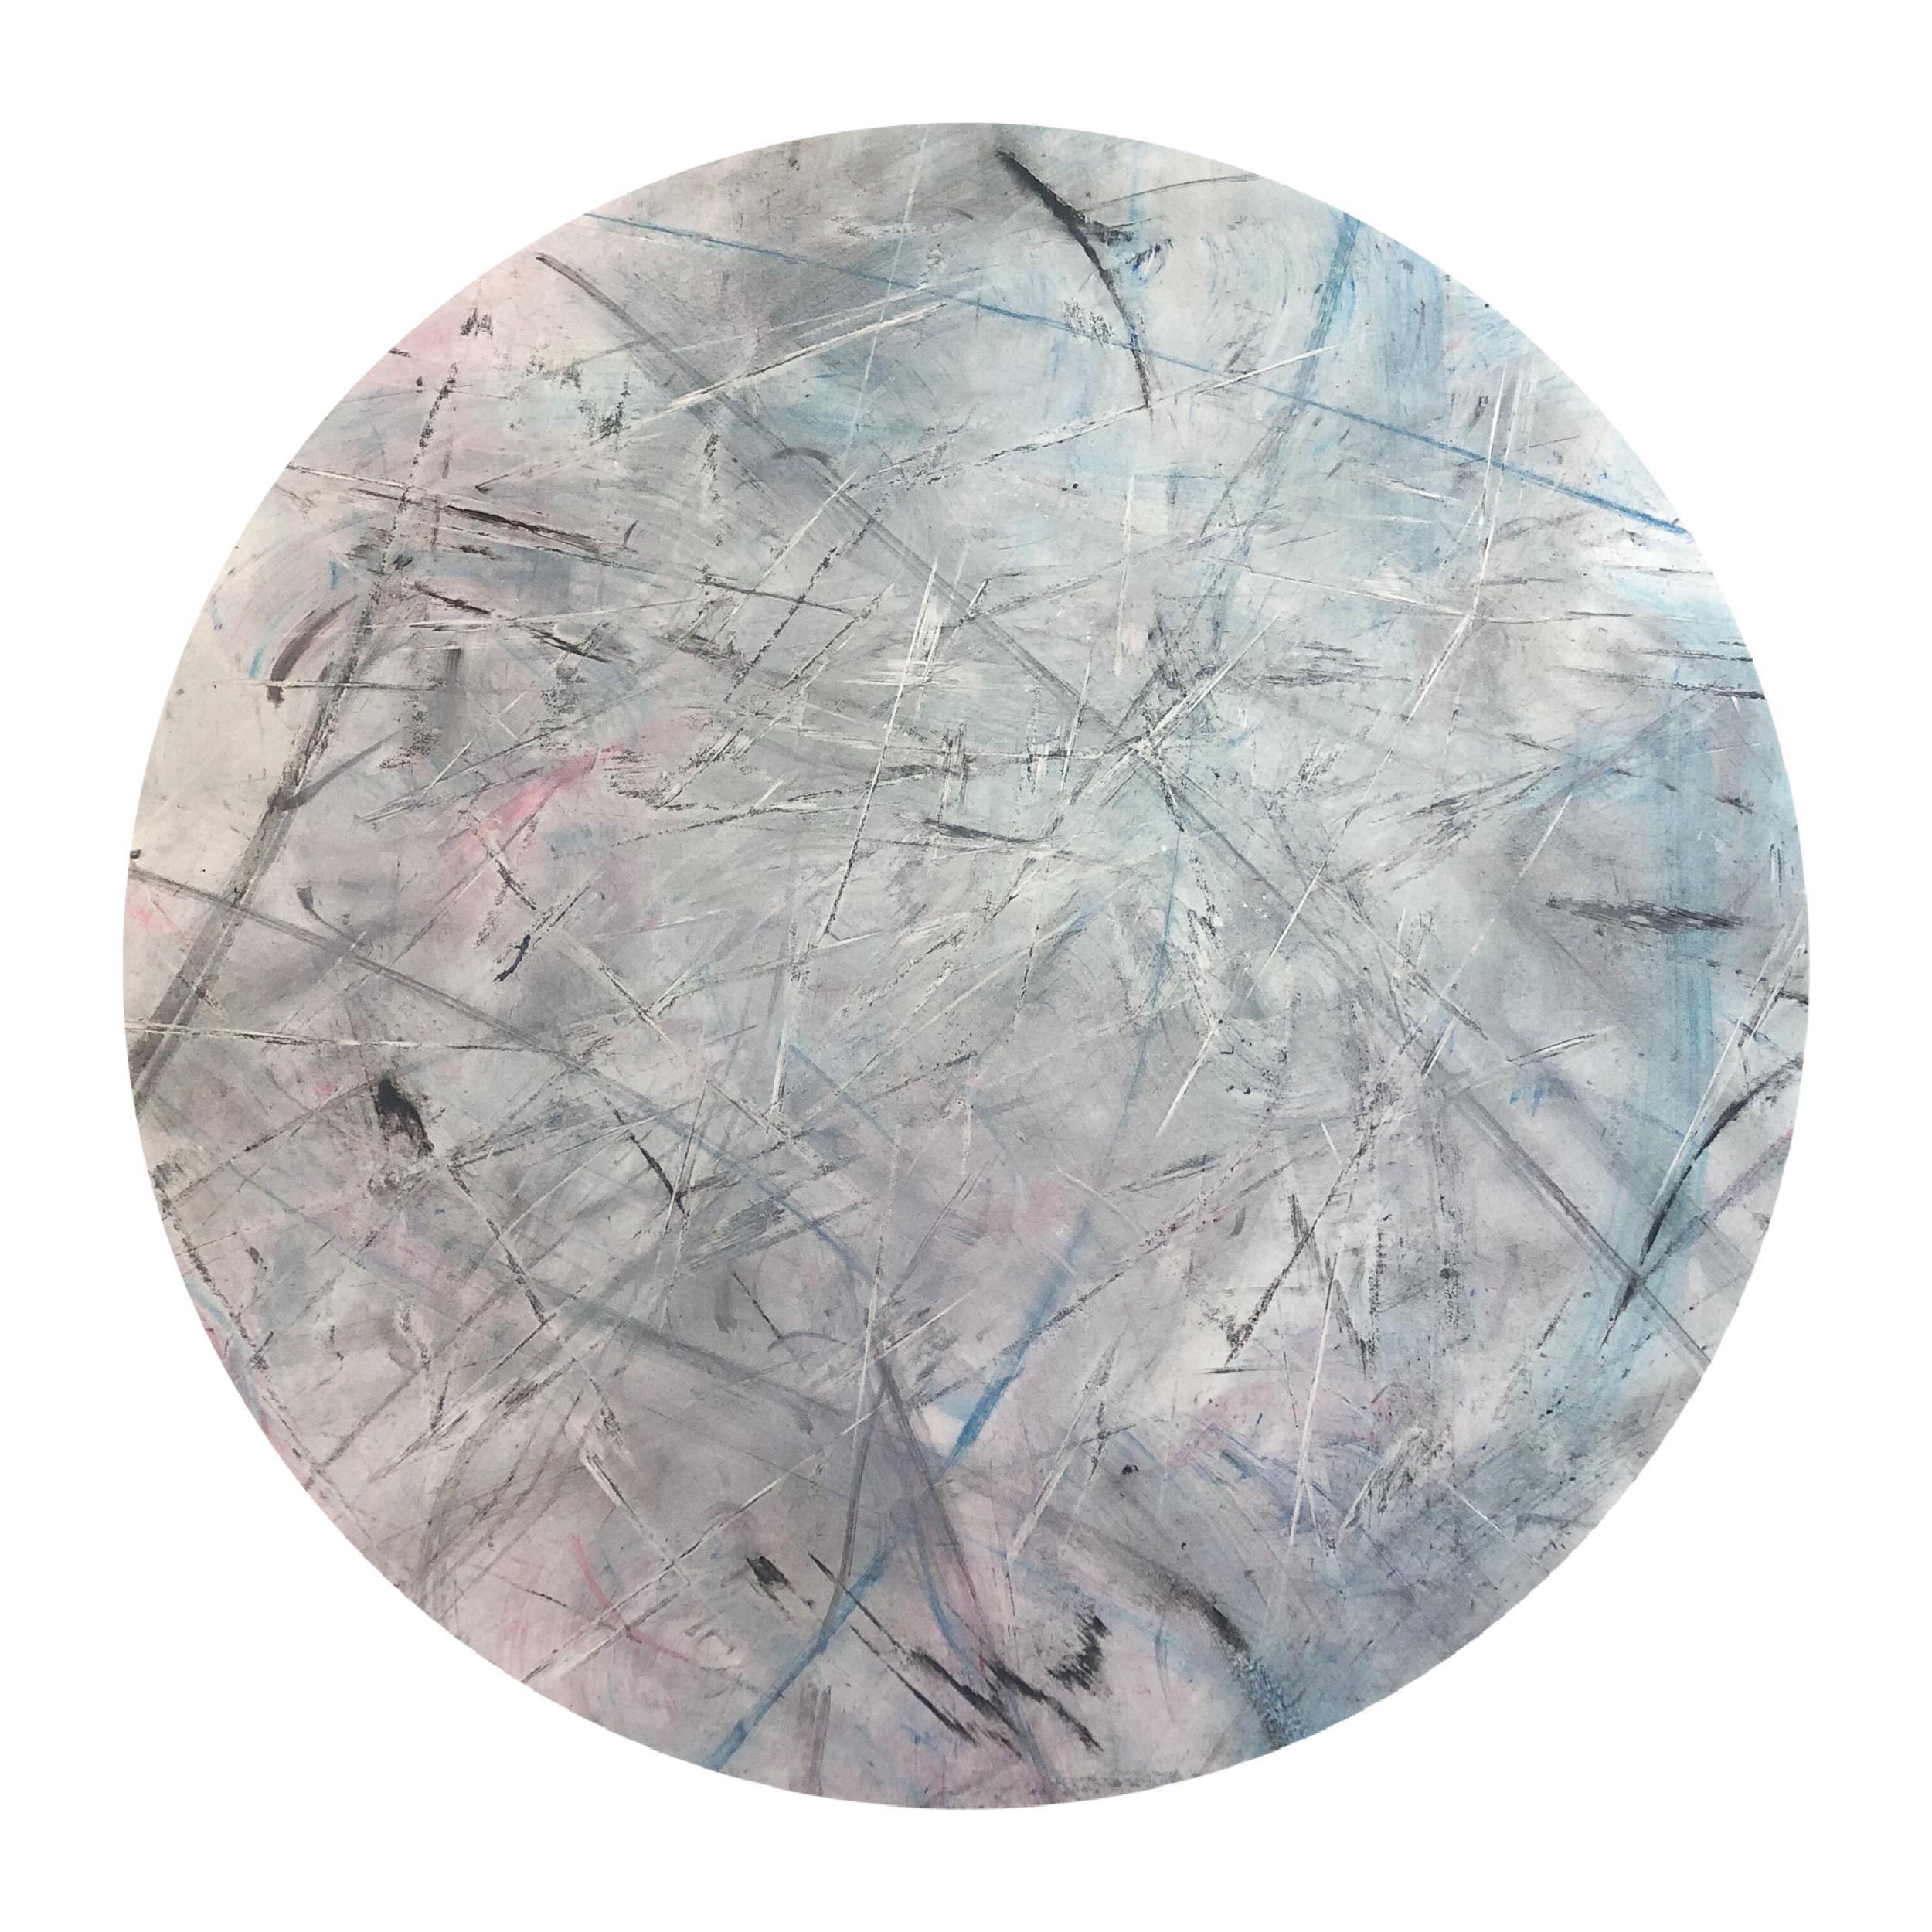 Utu / Haze   ø40cm/Charcoal/Pastels/HulaHoops